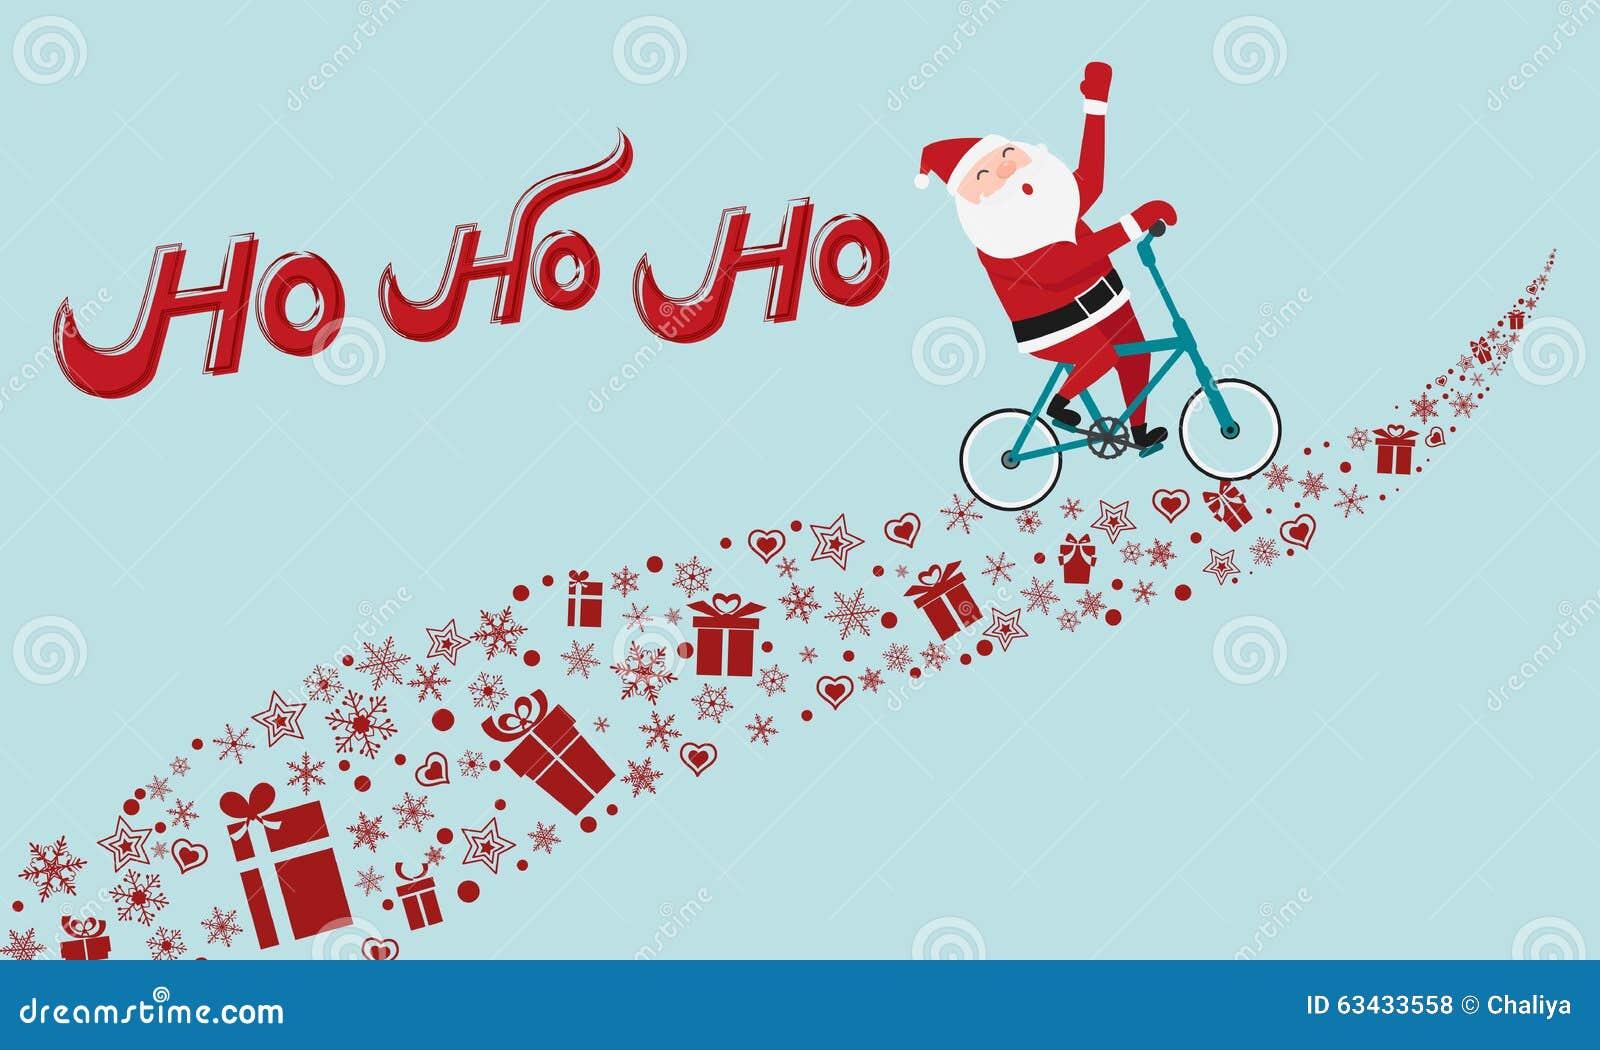 Ho Ho Ho Merry Christmas.Santa Claus Riding Bicycle On Gift Way Ho Ho Ho Merry